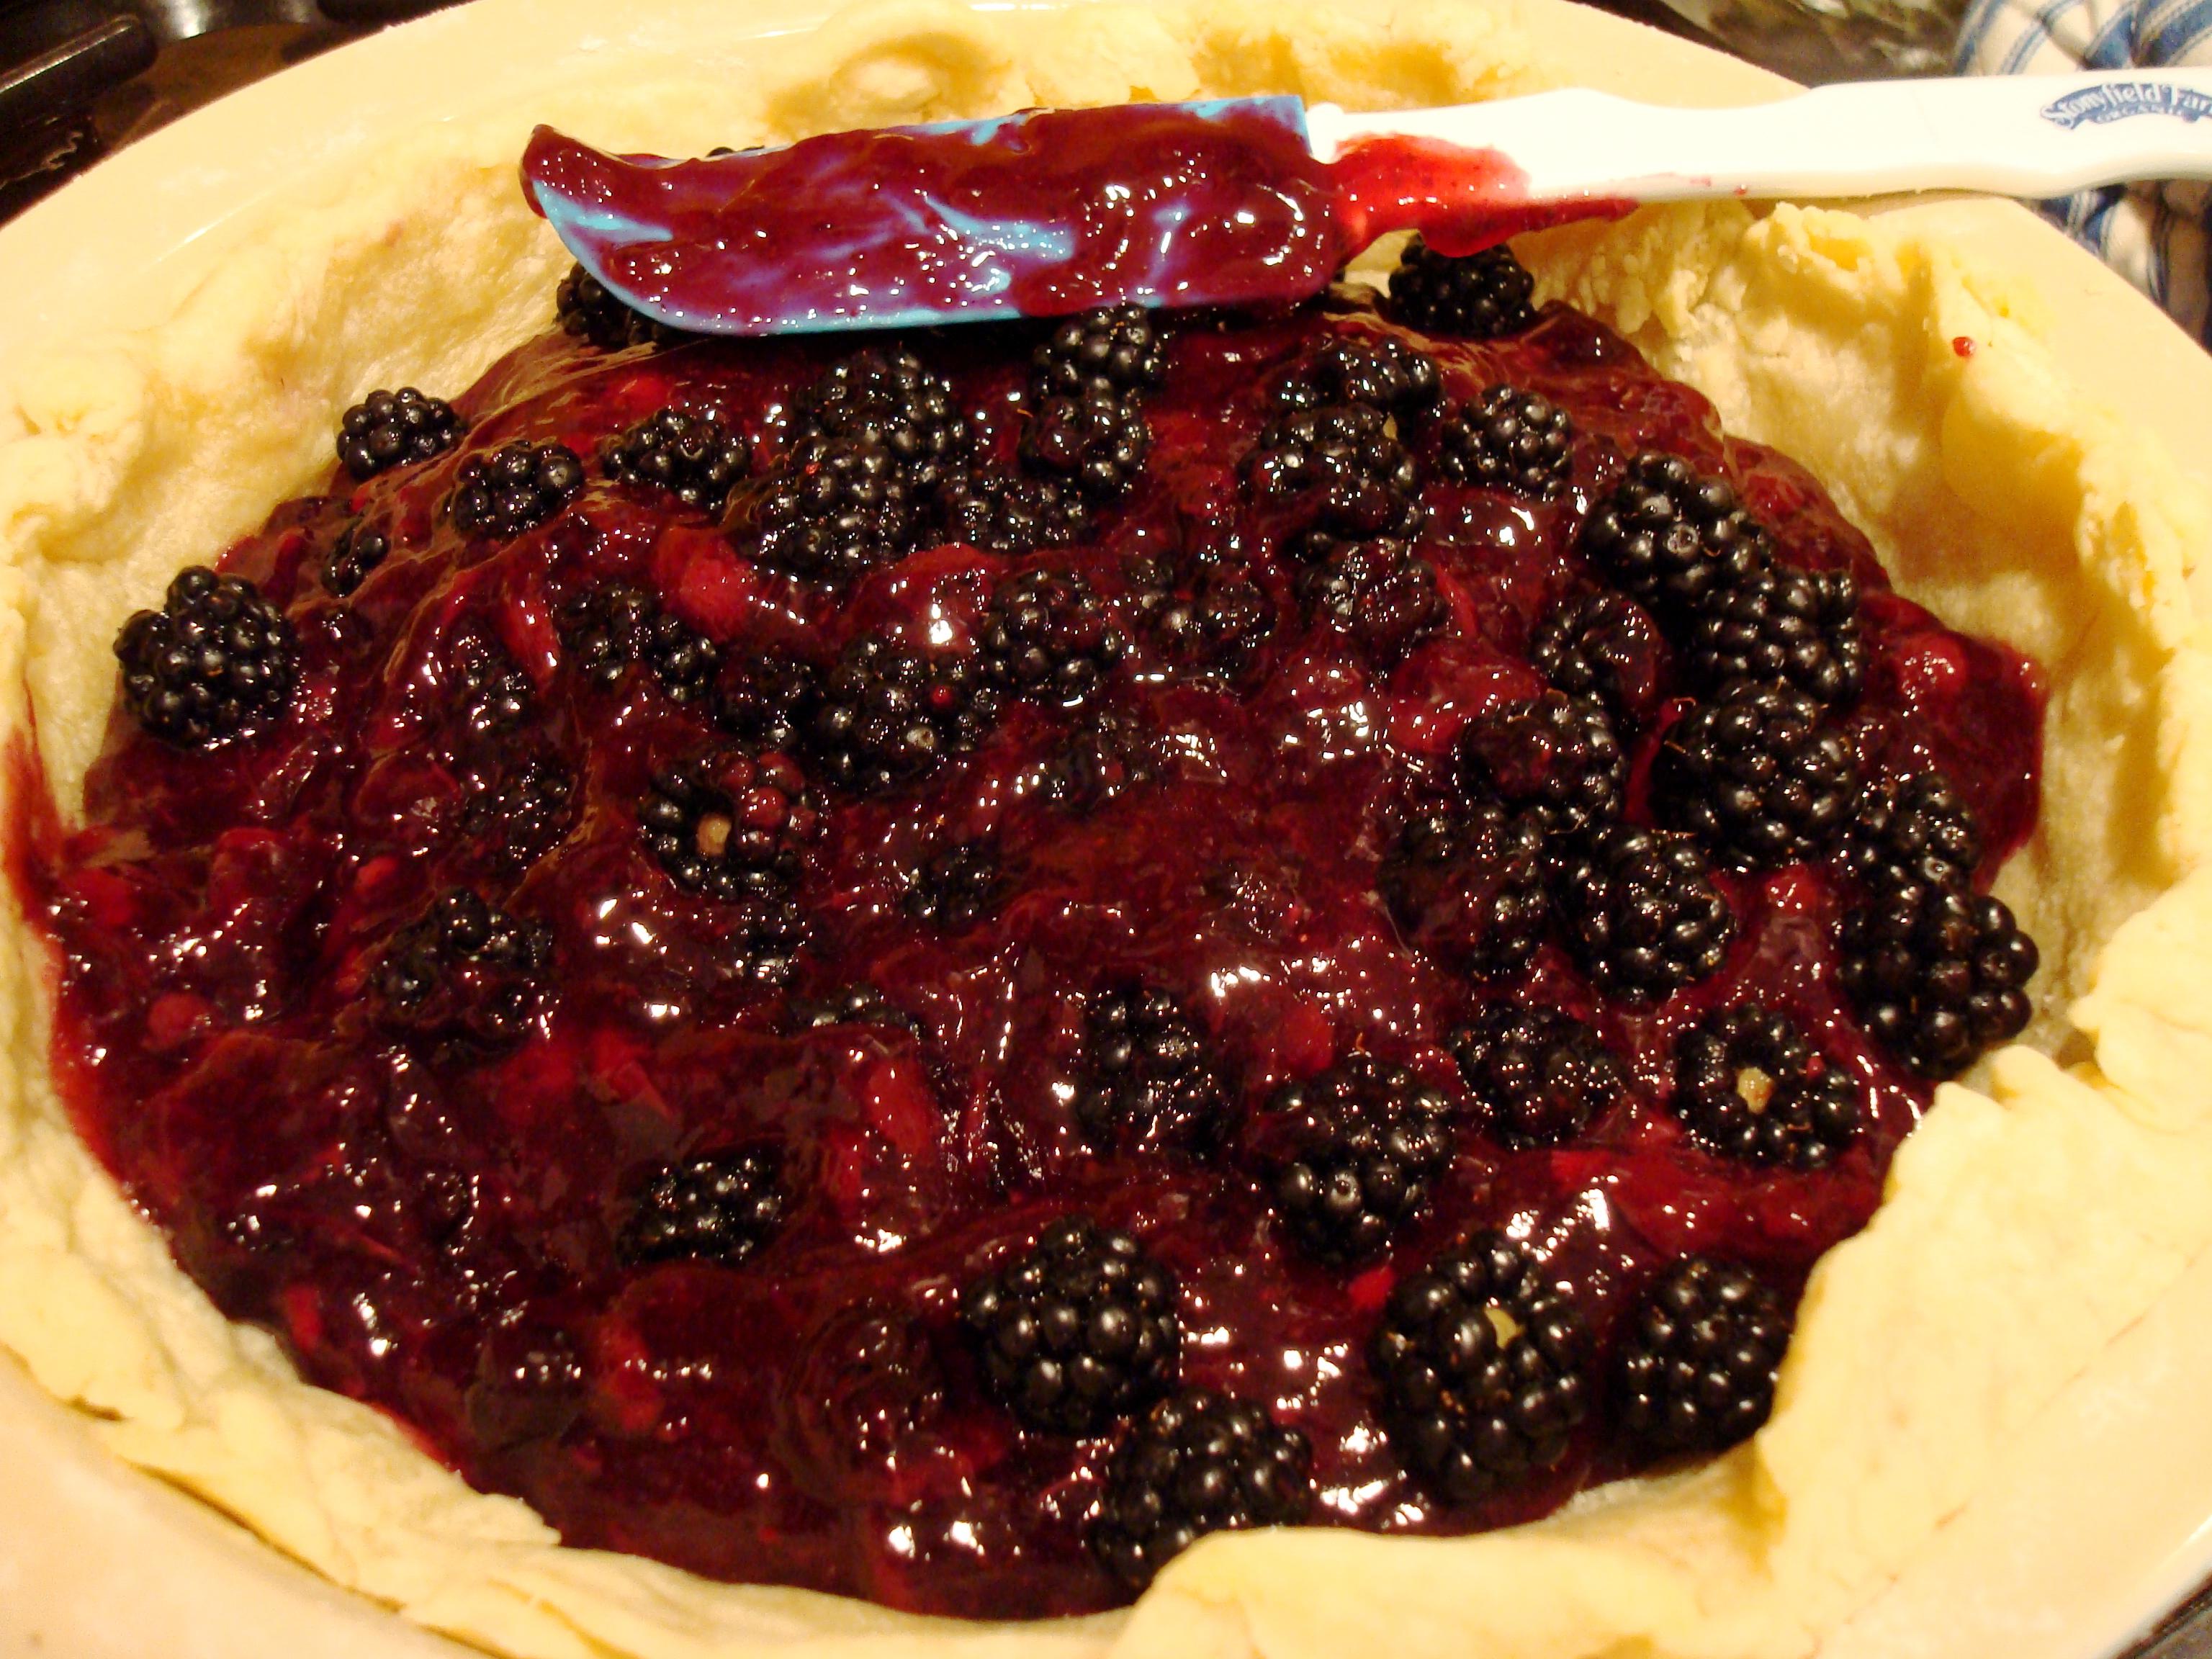 My blueberry blackberry homemade butter crust creation.